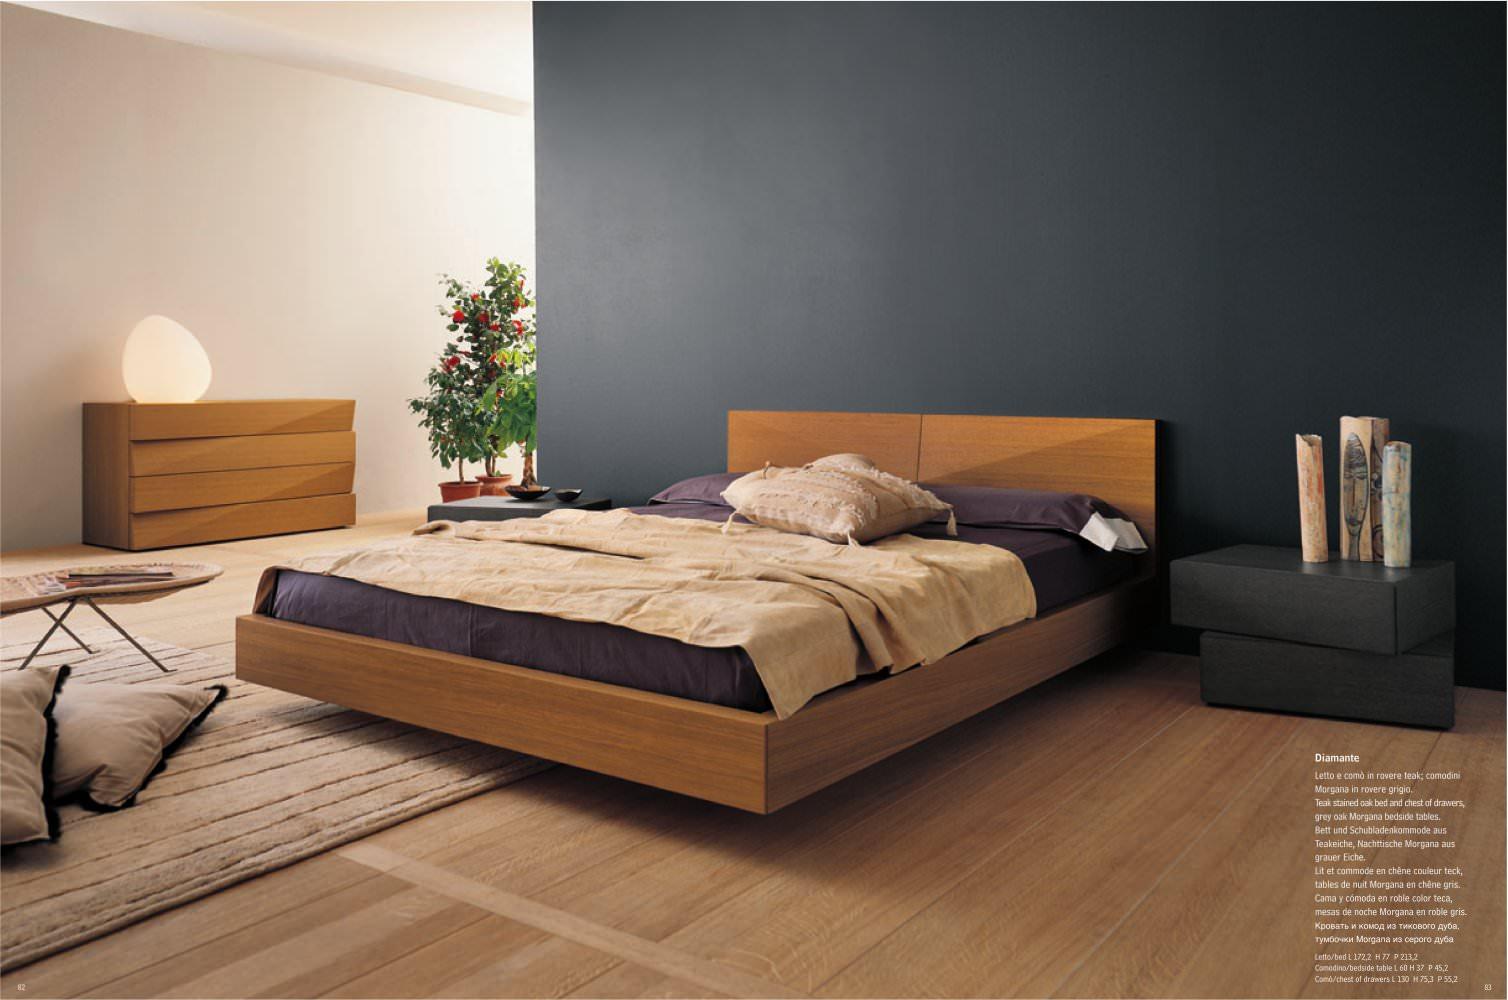 Bedroom design 2013: Bed Designs Catalogue